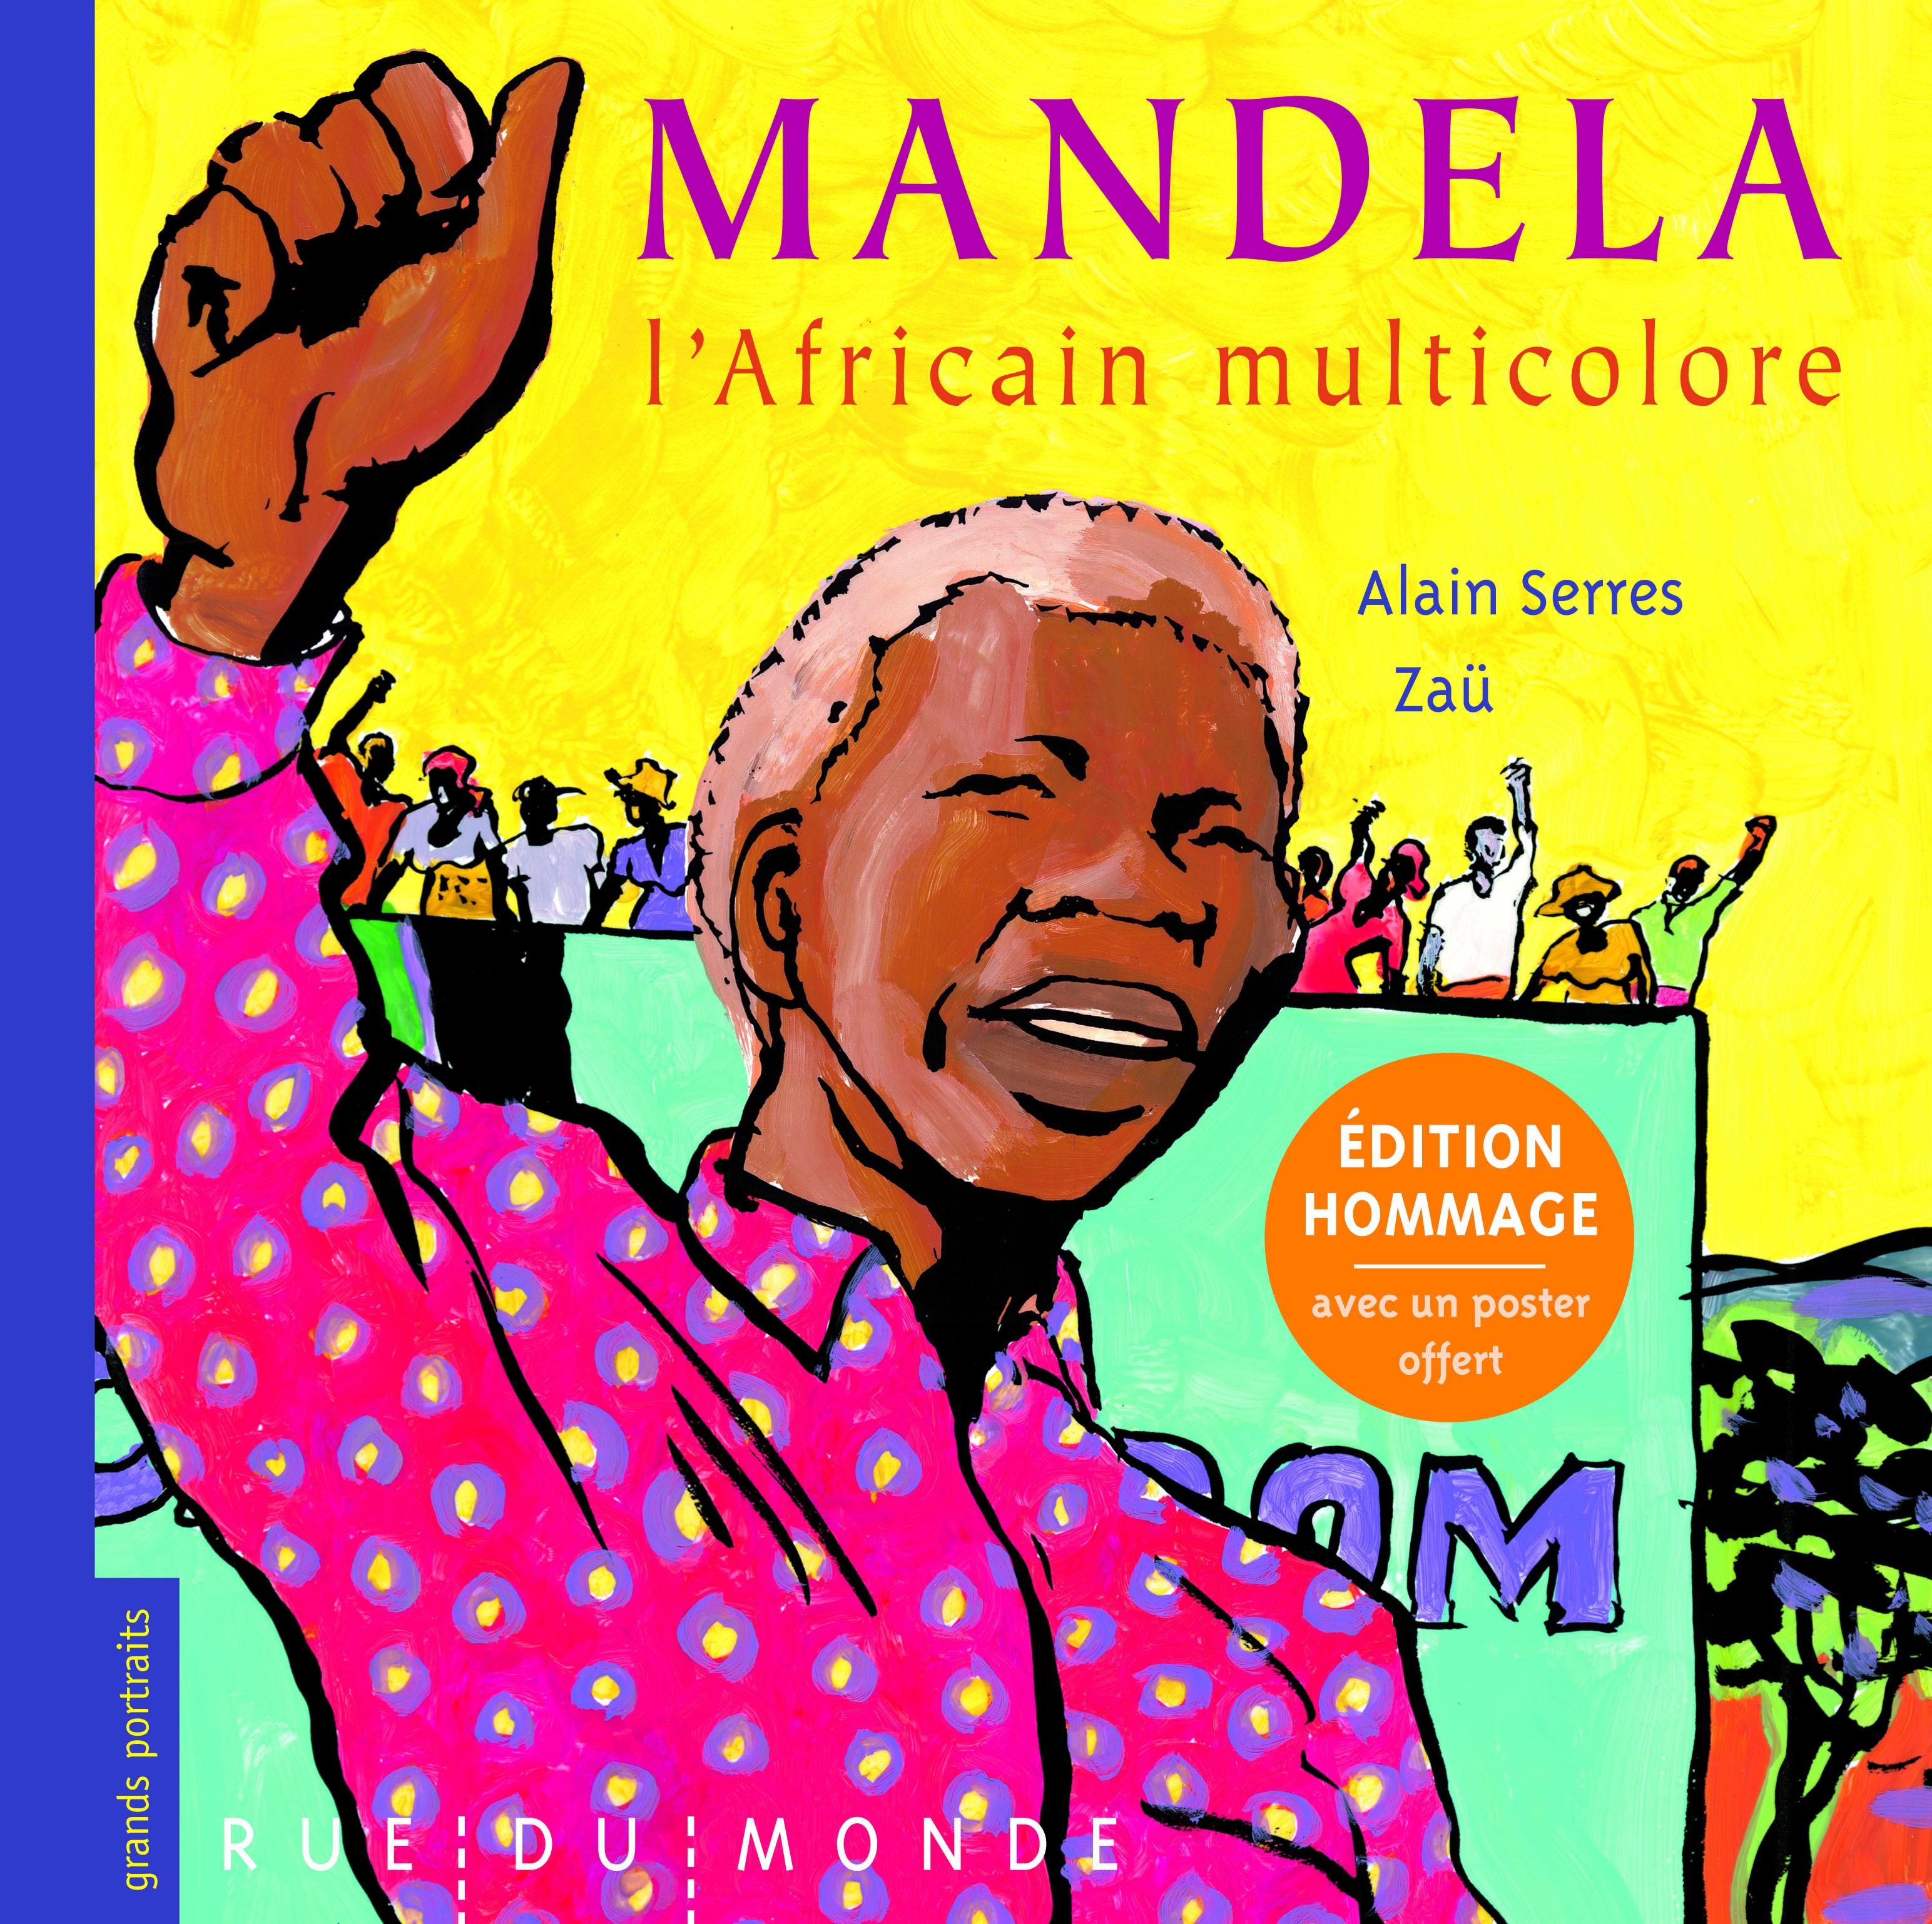 MANDELA, L'AFRICAIN MULTICOLORE - EDITION HOMMAGE